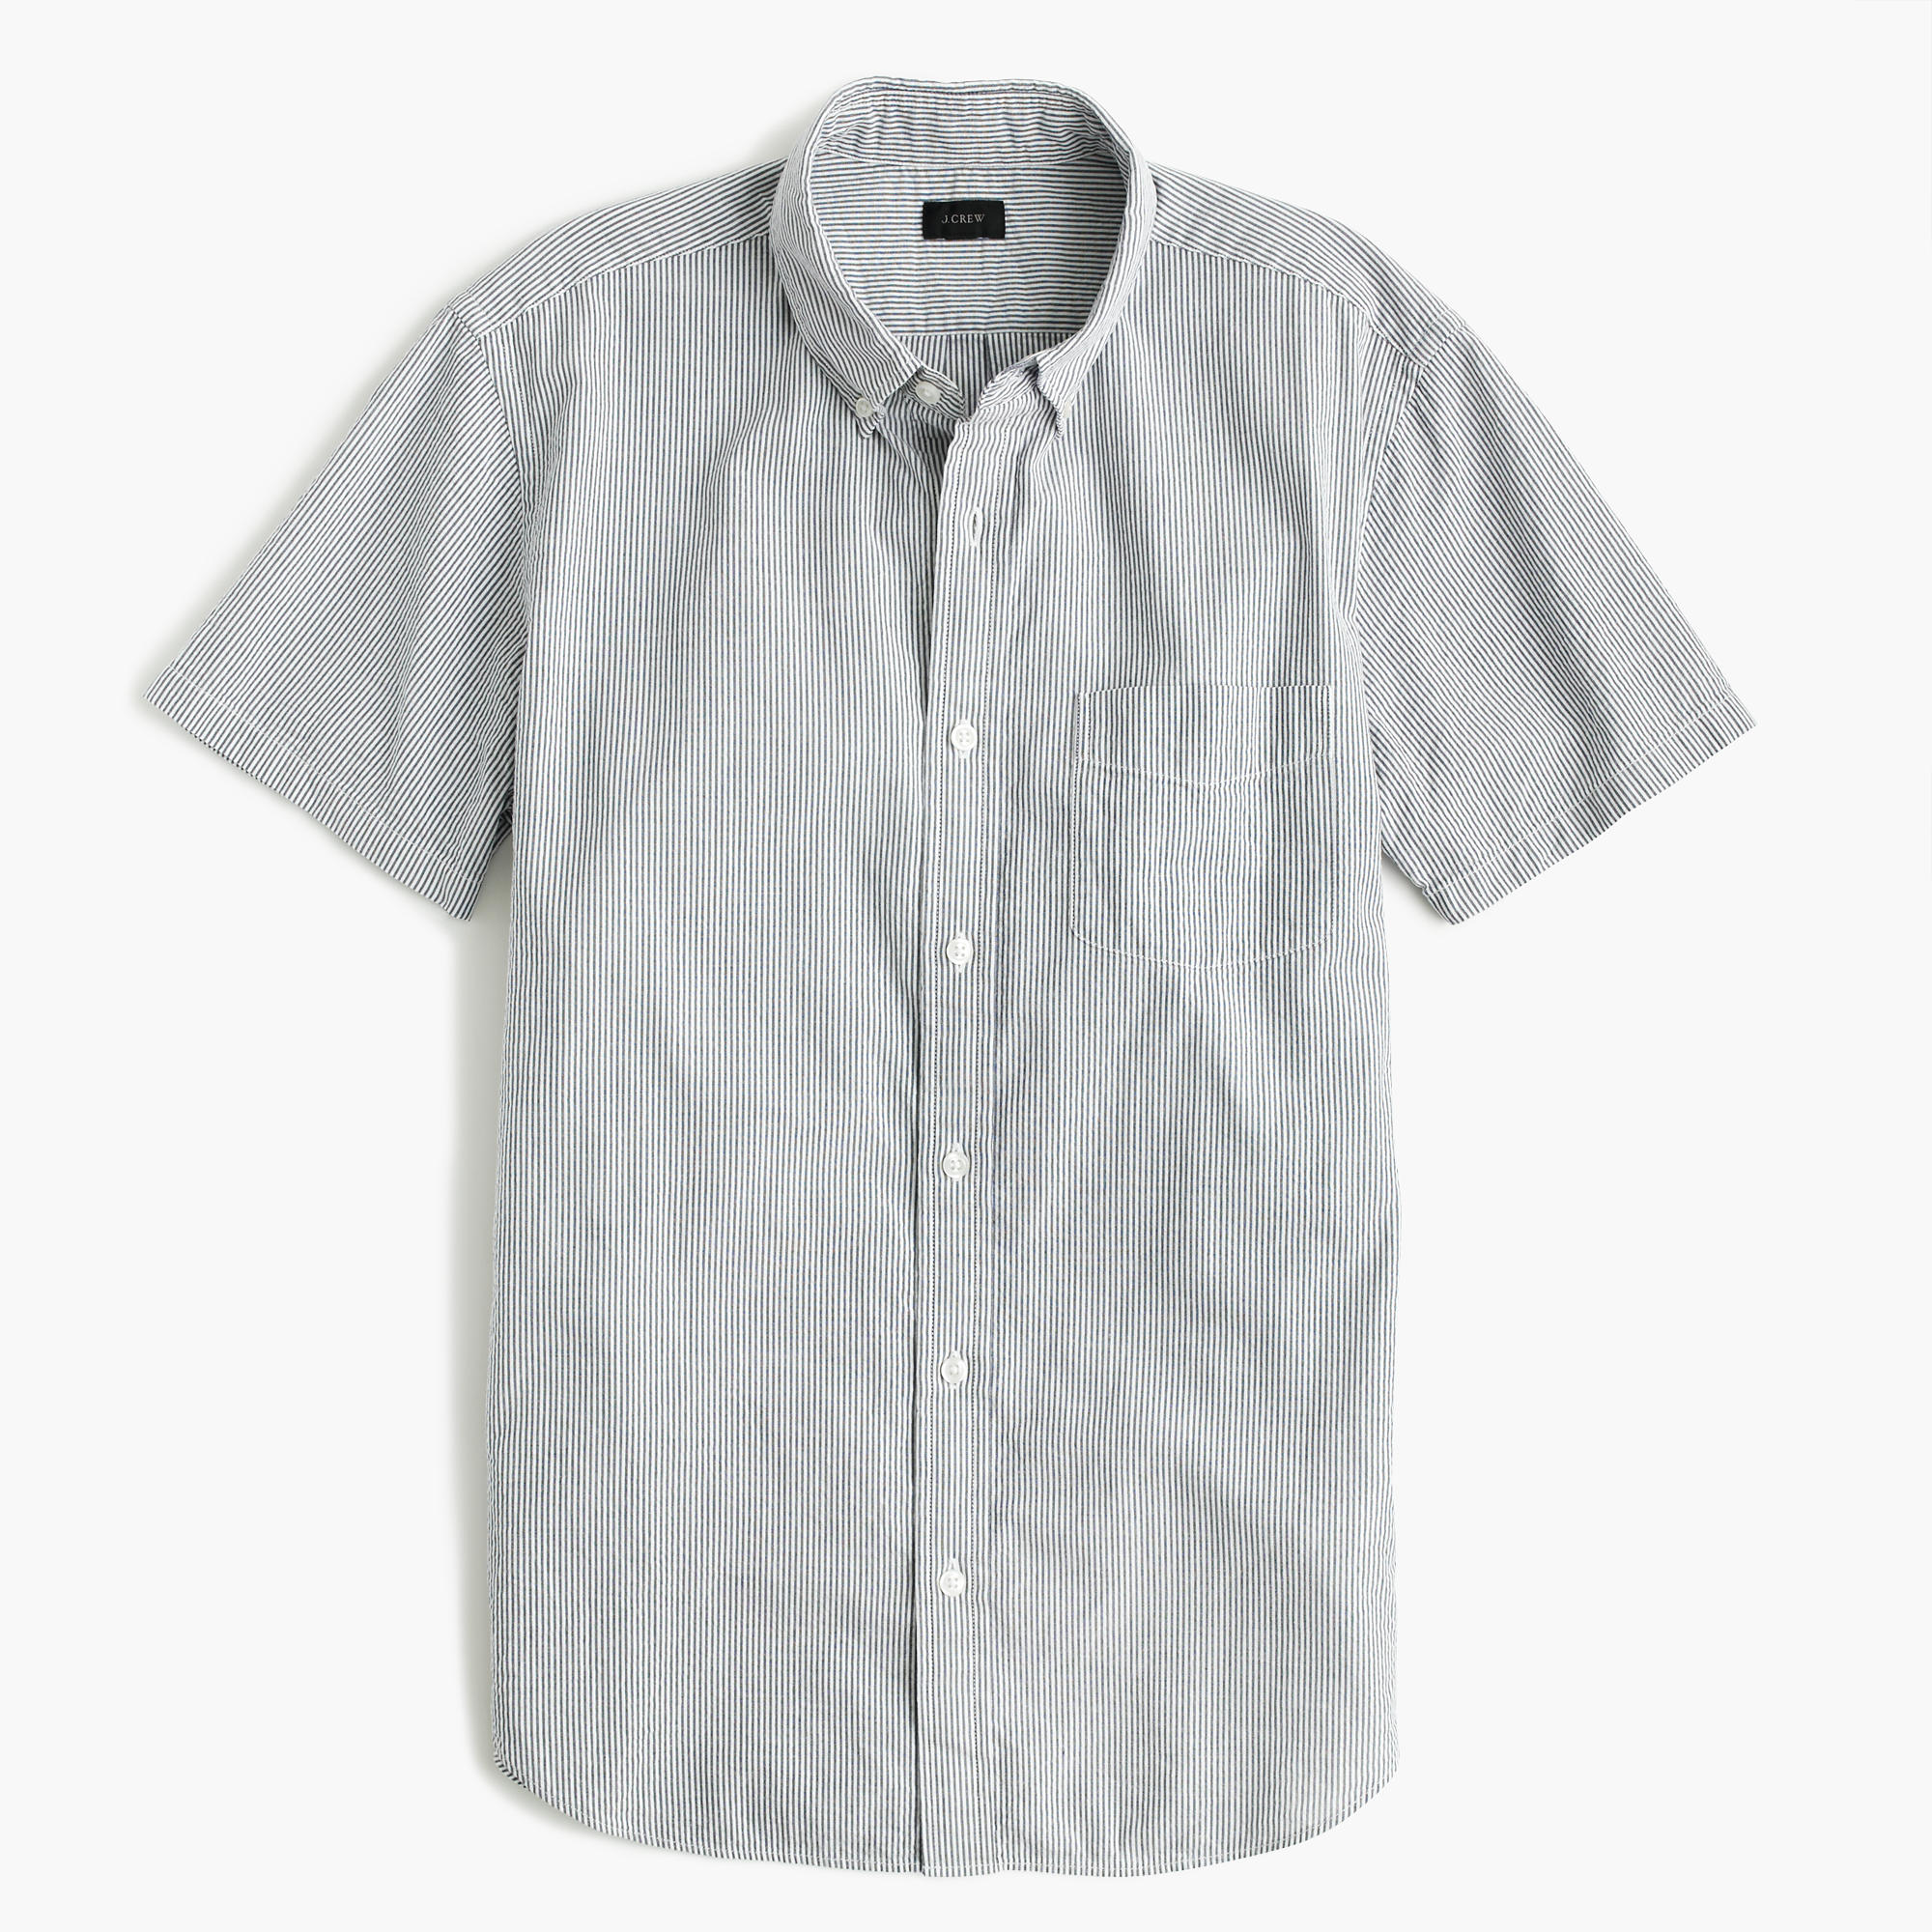 Mens Seersucker Shirts Short Sleeve